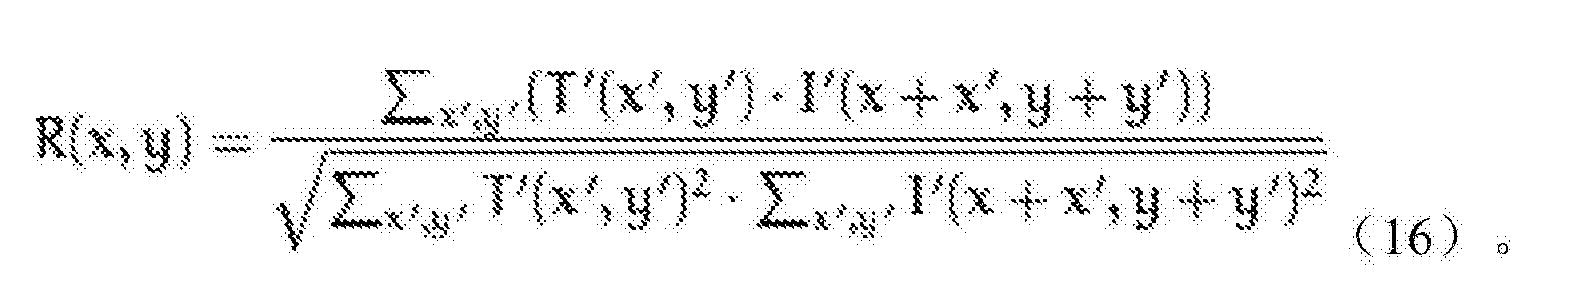 Figure CN106390220AD00393